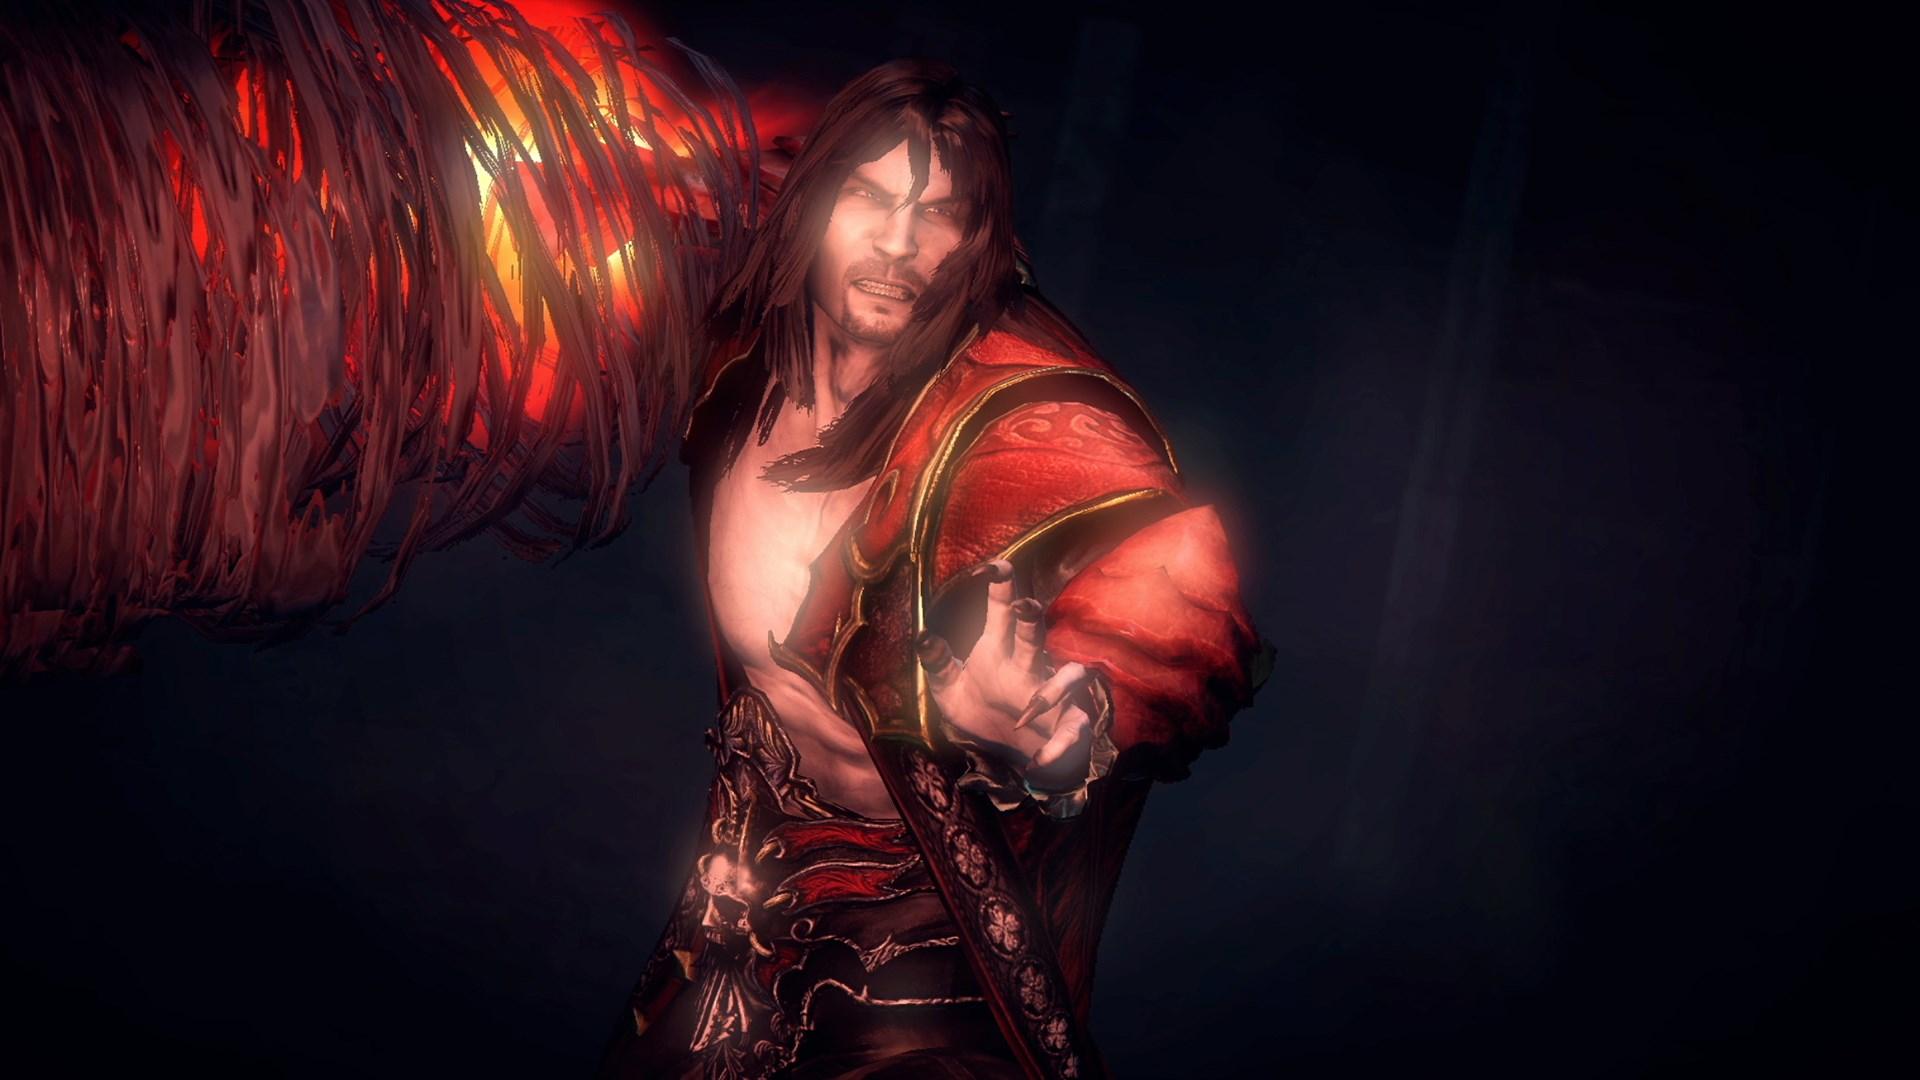 Screenshoty z Castlevania: Lords of Shadow 2 83319